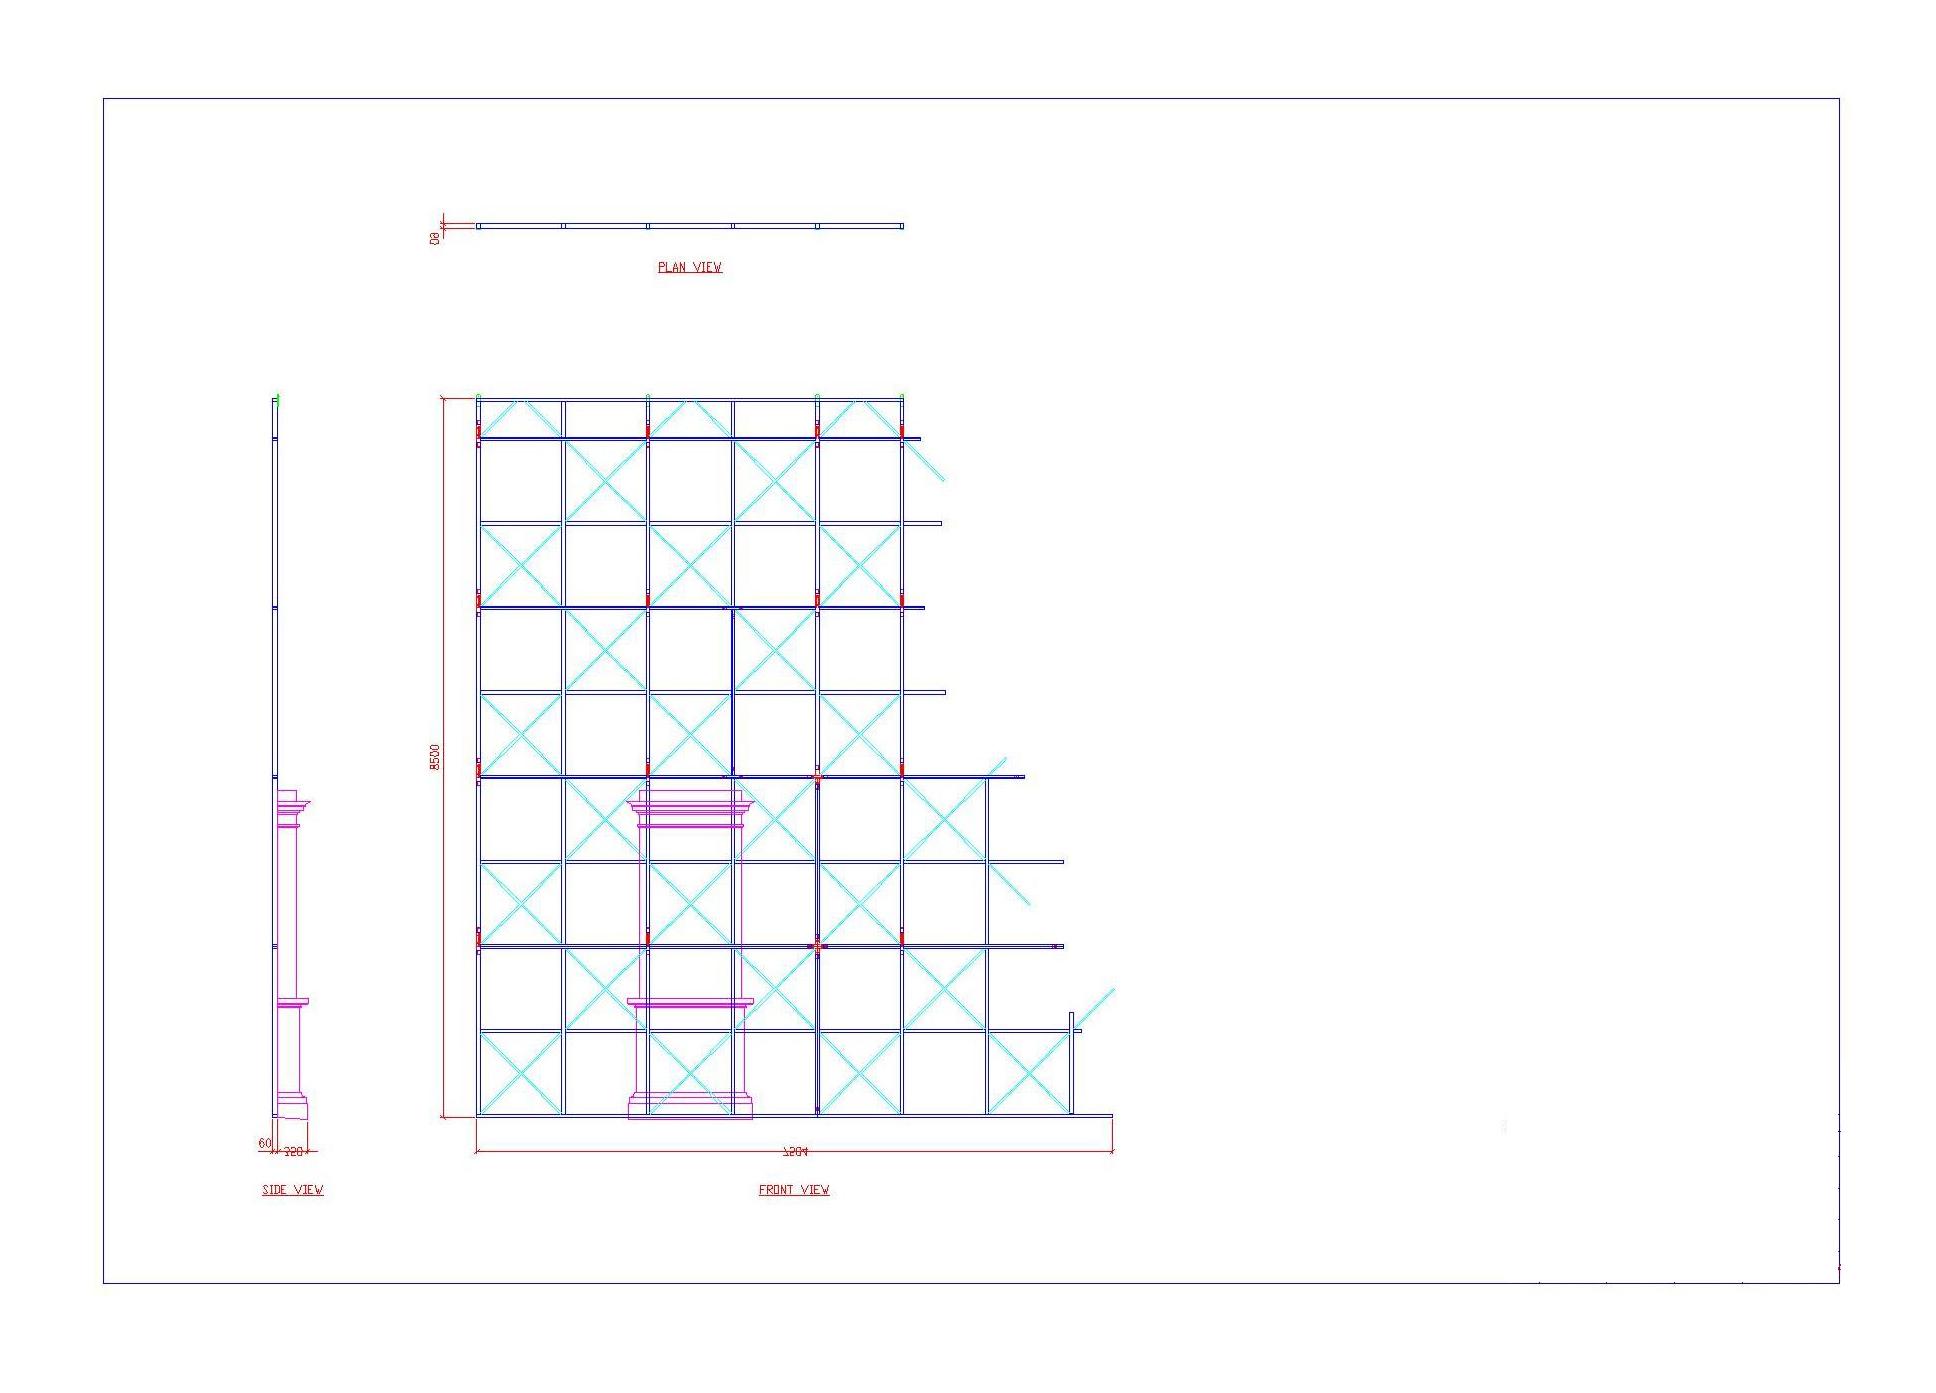 cts-stove-wall -layout-model